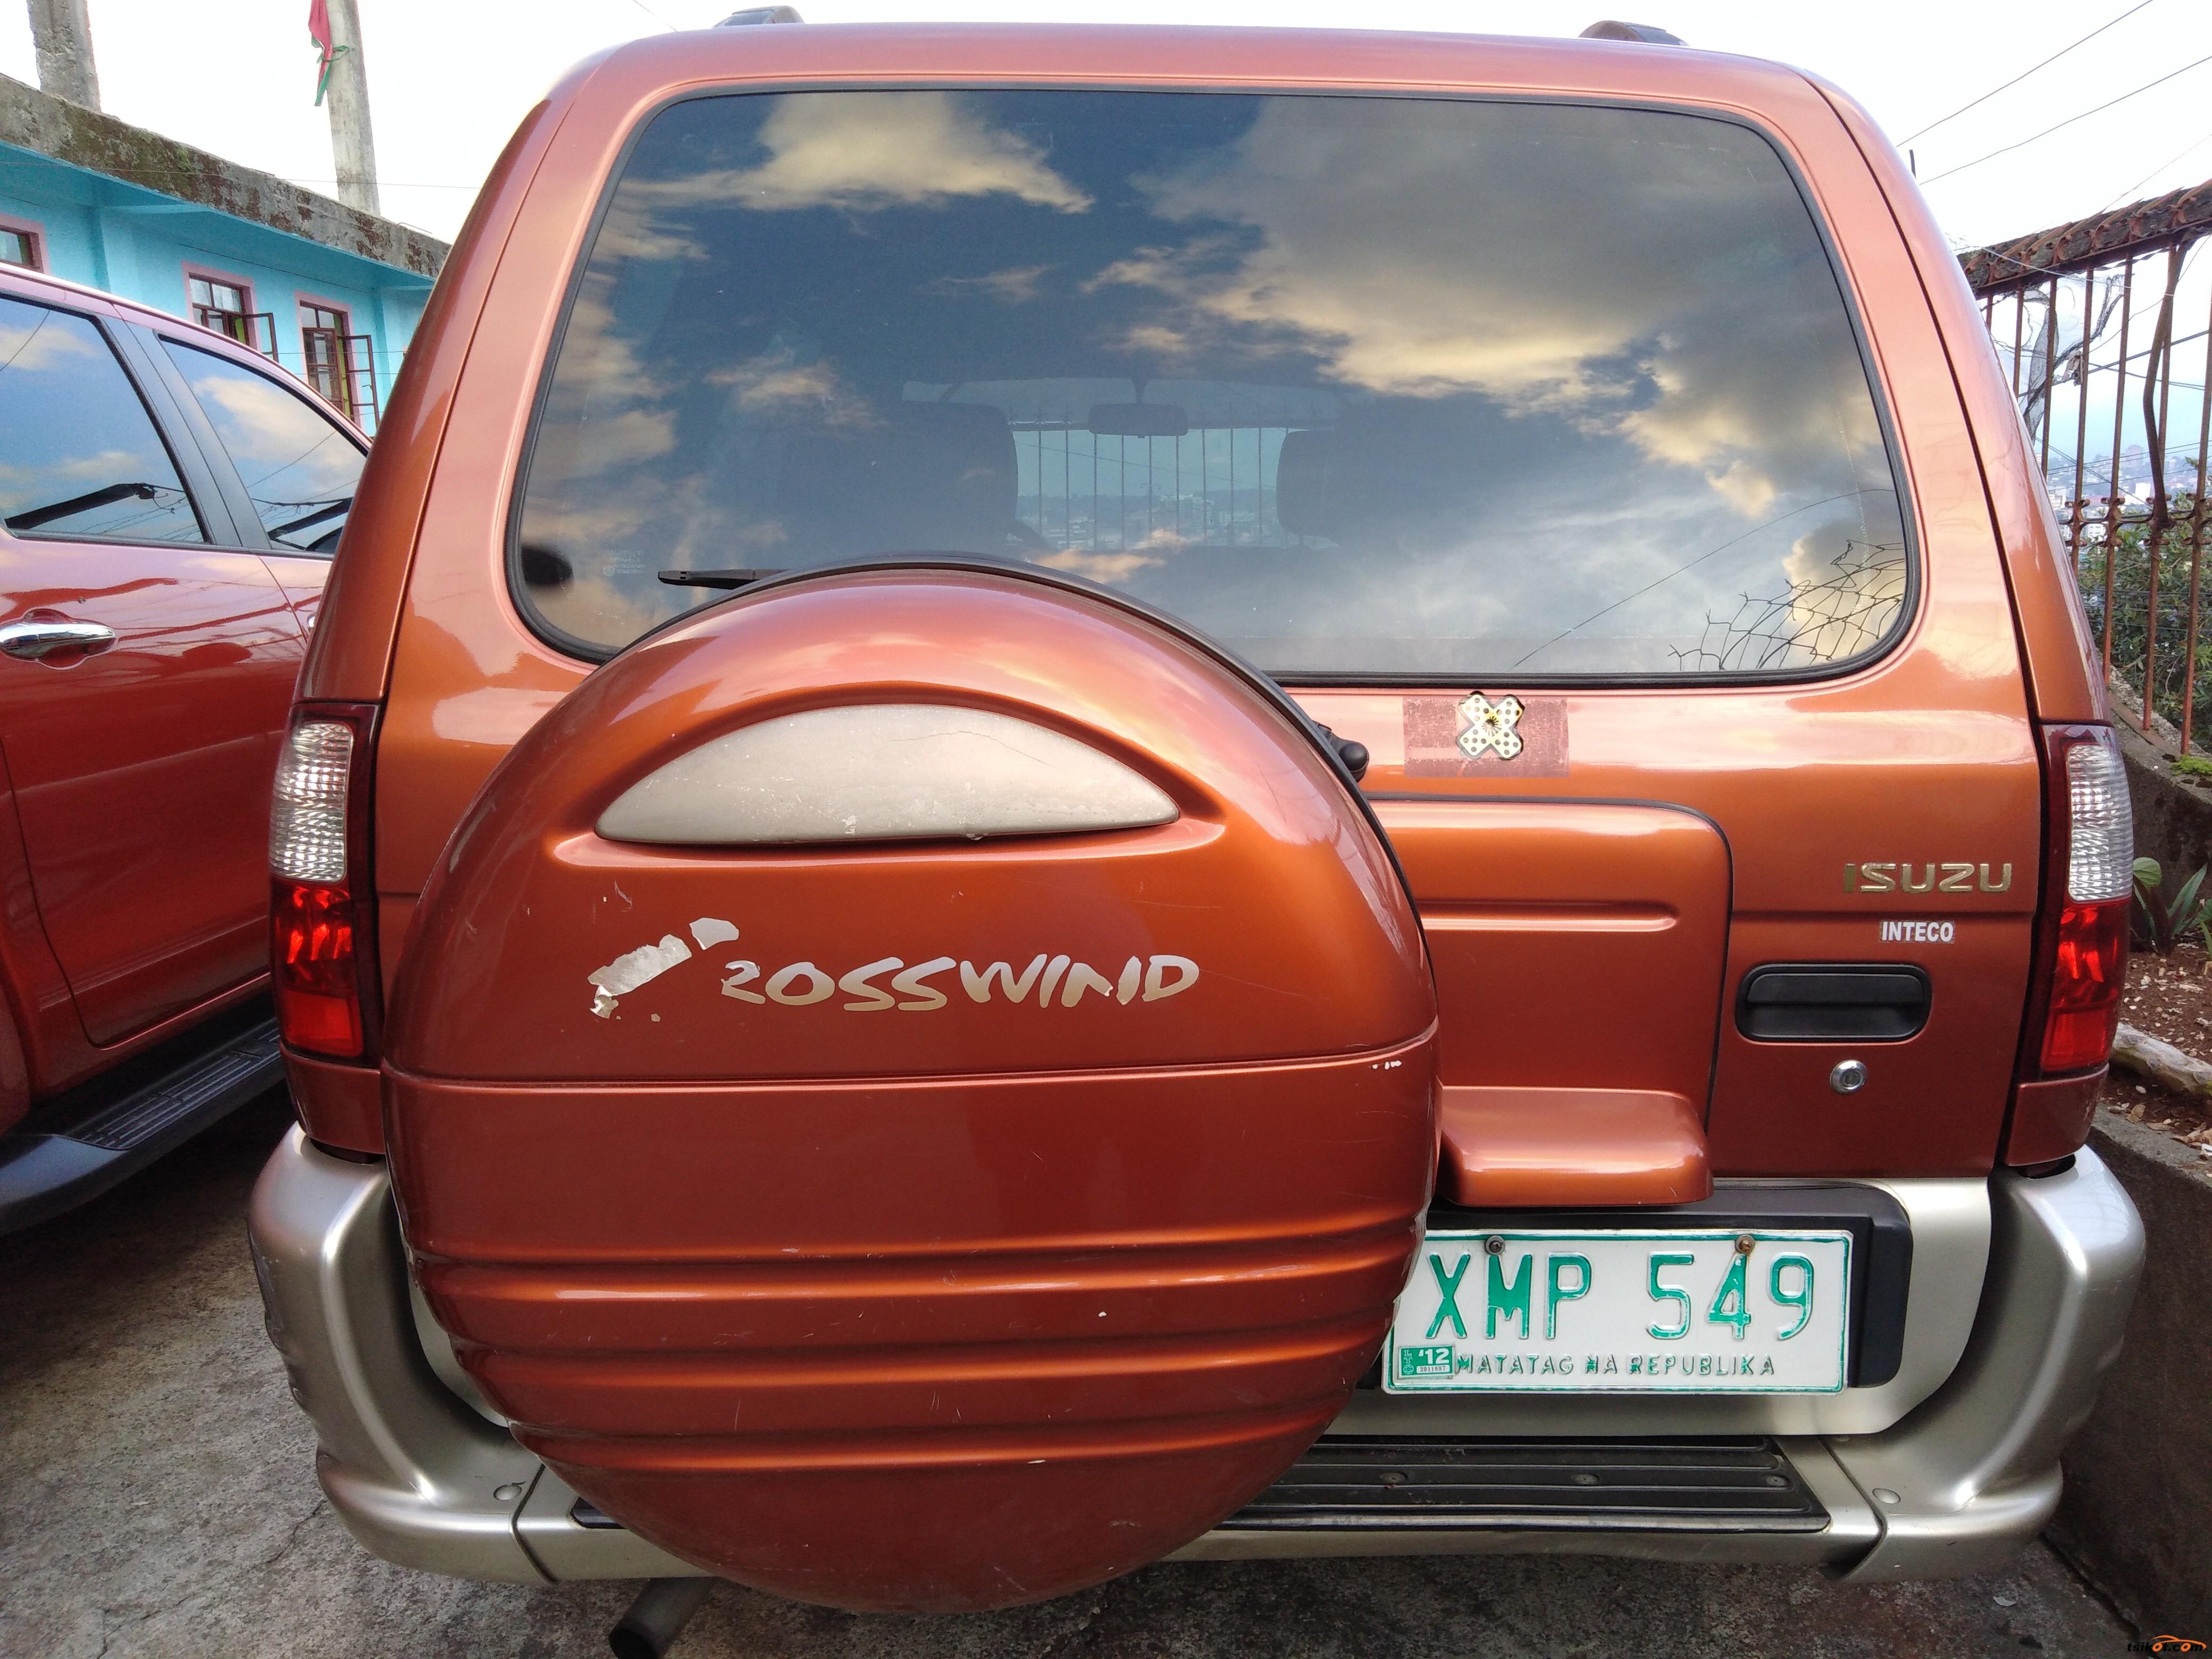 Isuzu Crosswind 2003 - 6